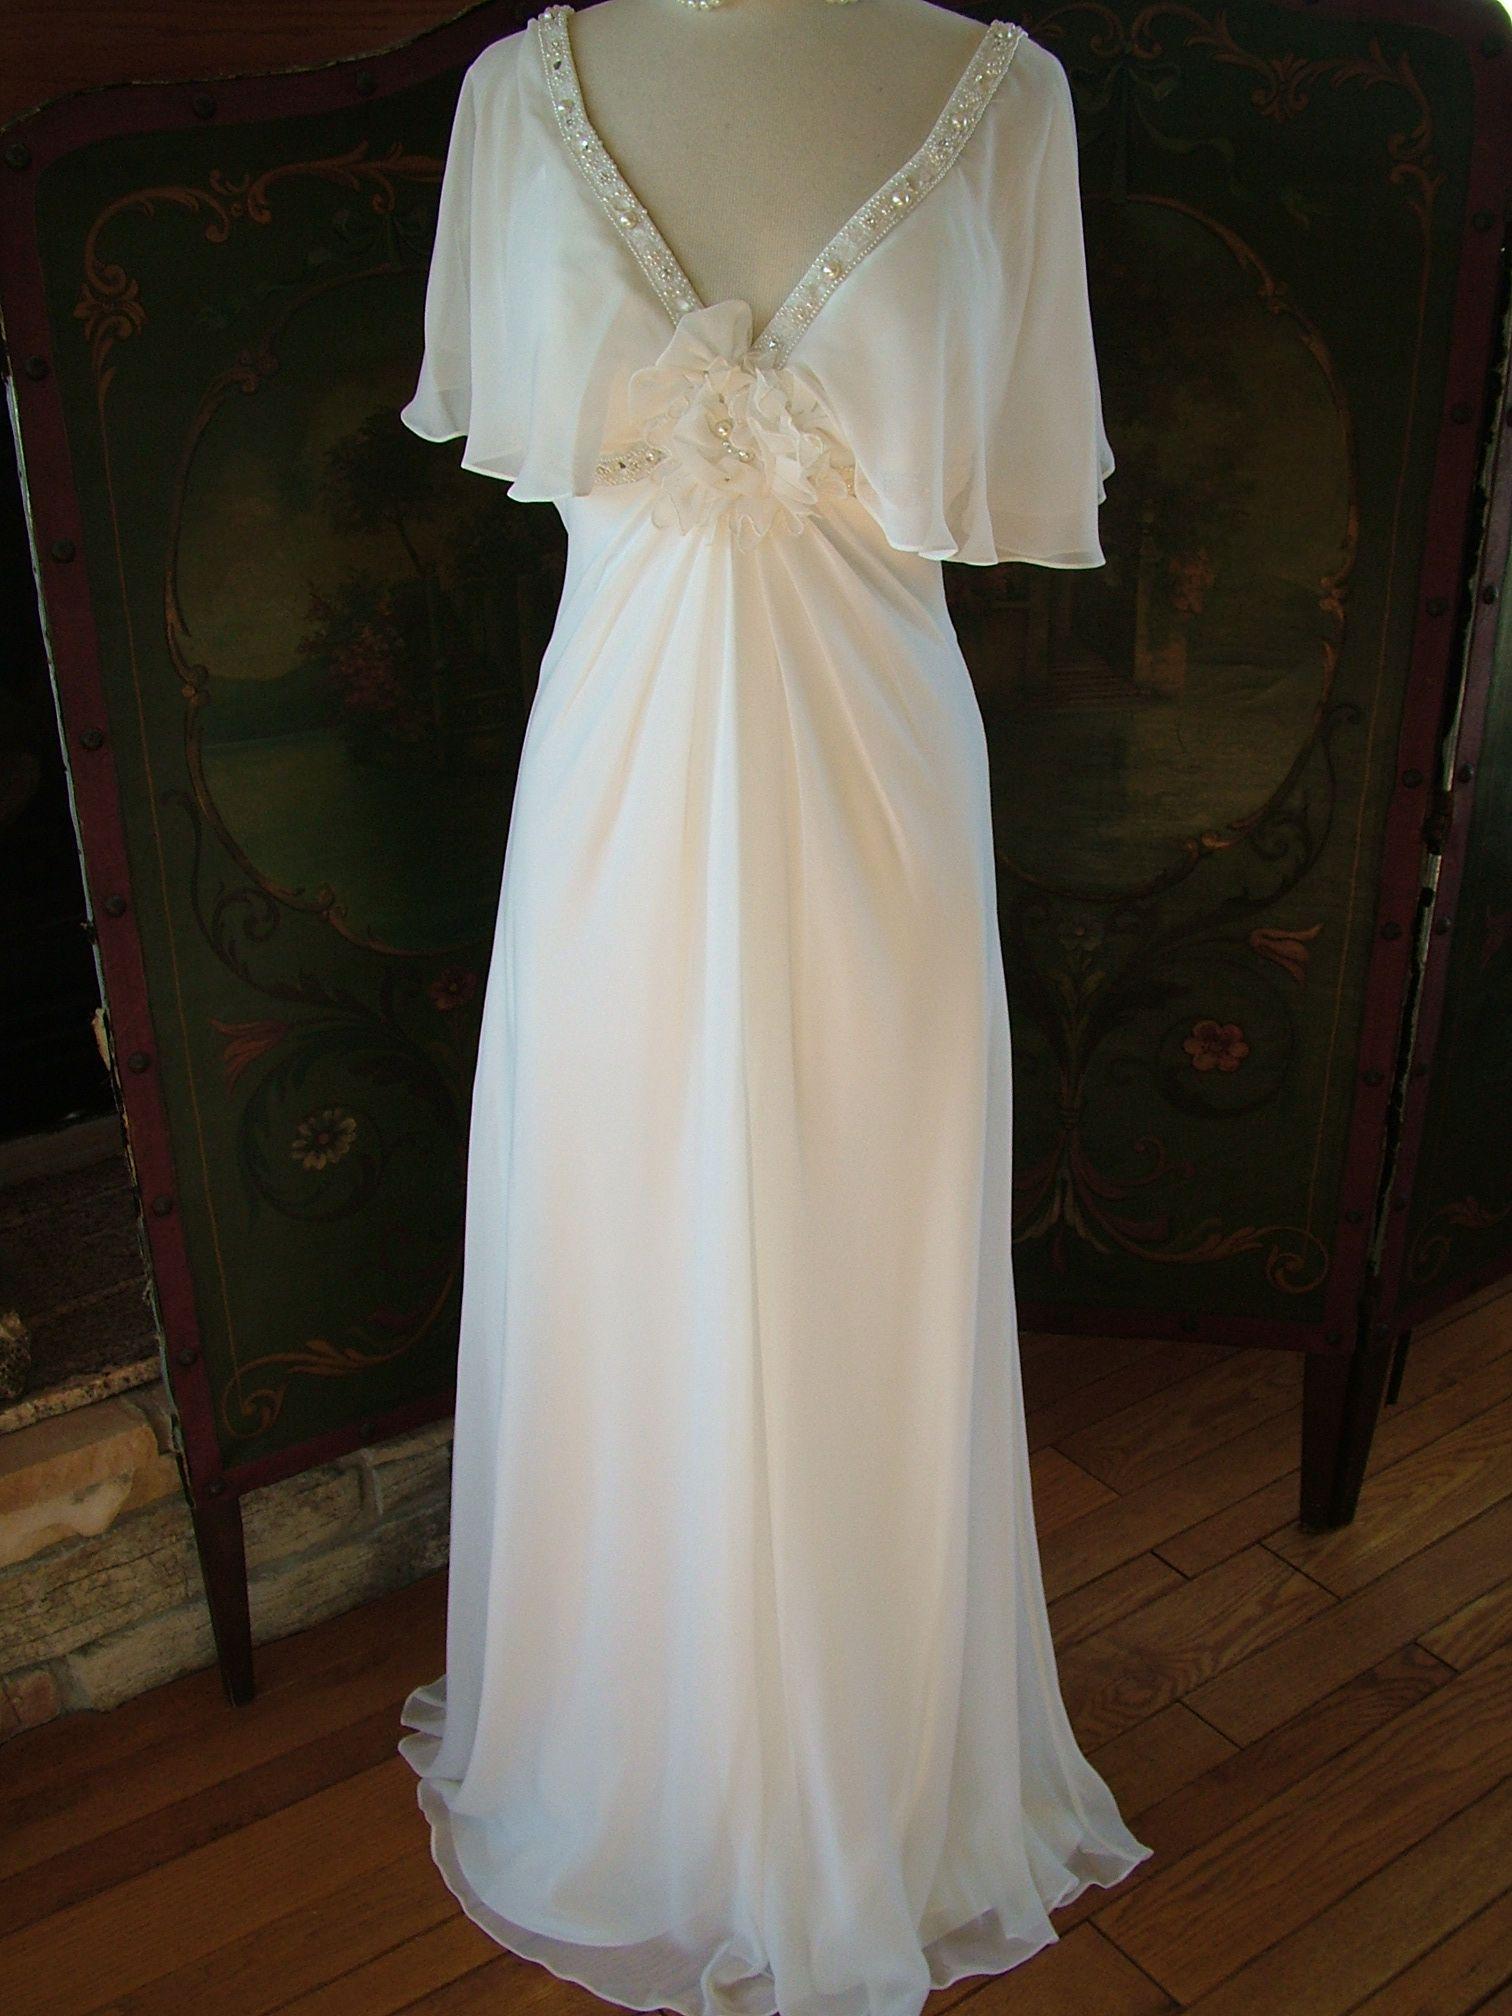 Vintage 1930s inspired wedding dress petal sleeve chiffon for 1930s inspired wedding dresses